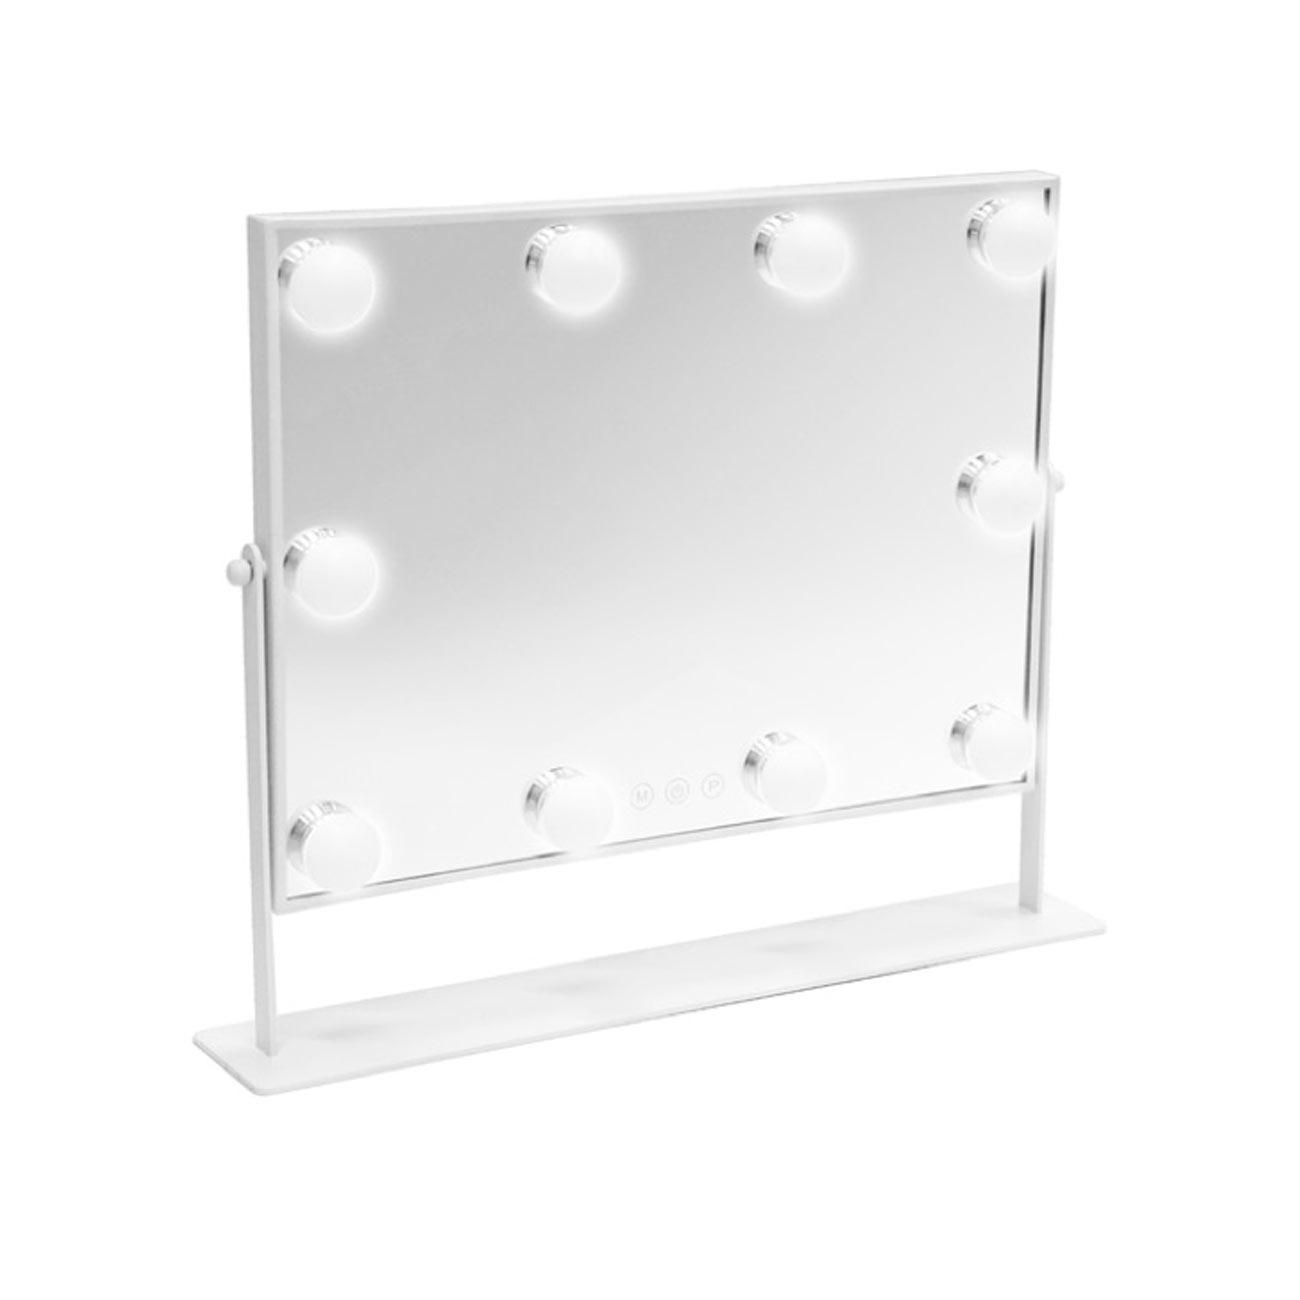 Danielle Large LED Hollywood Vanity Mirror - White